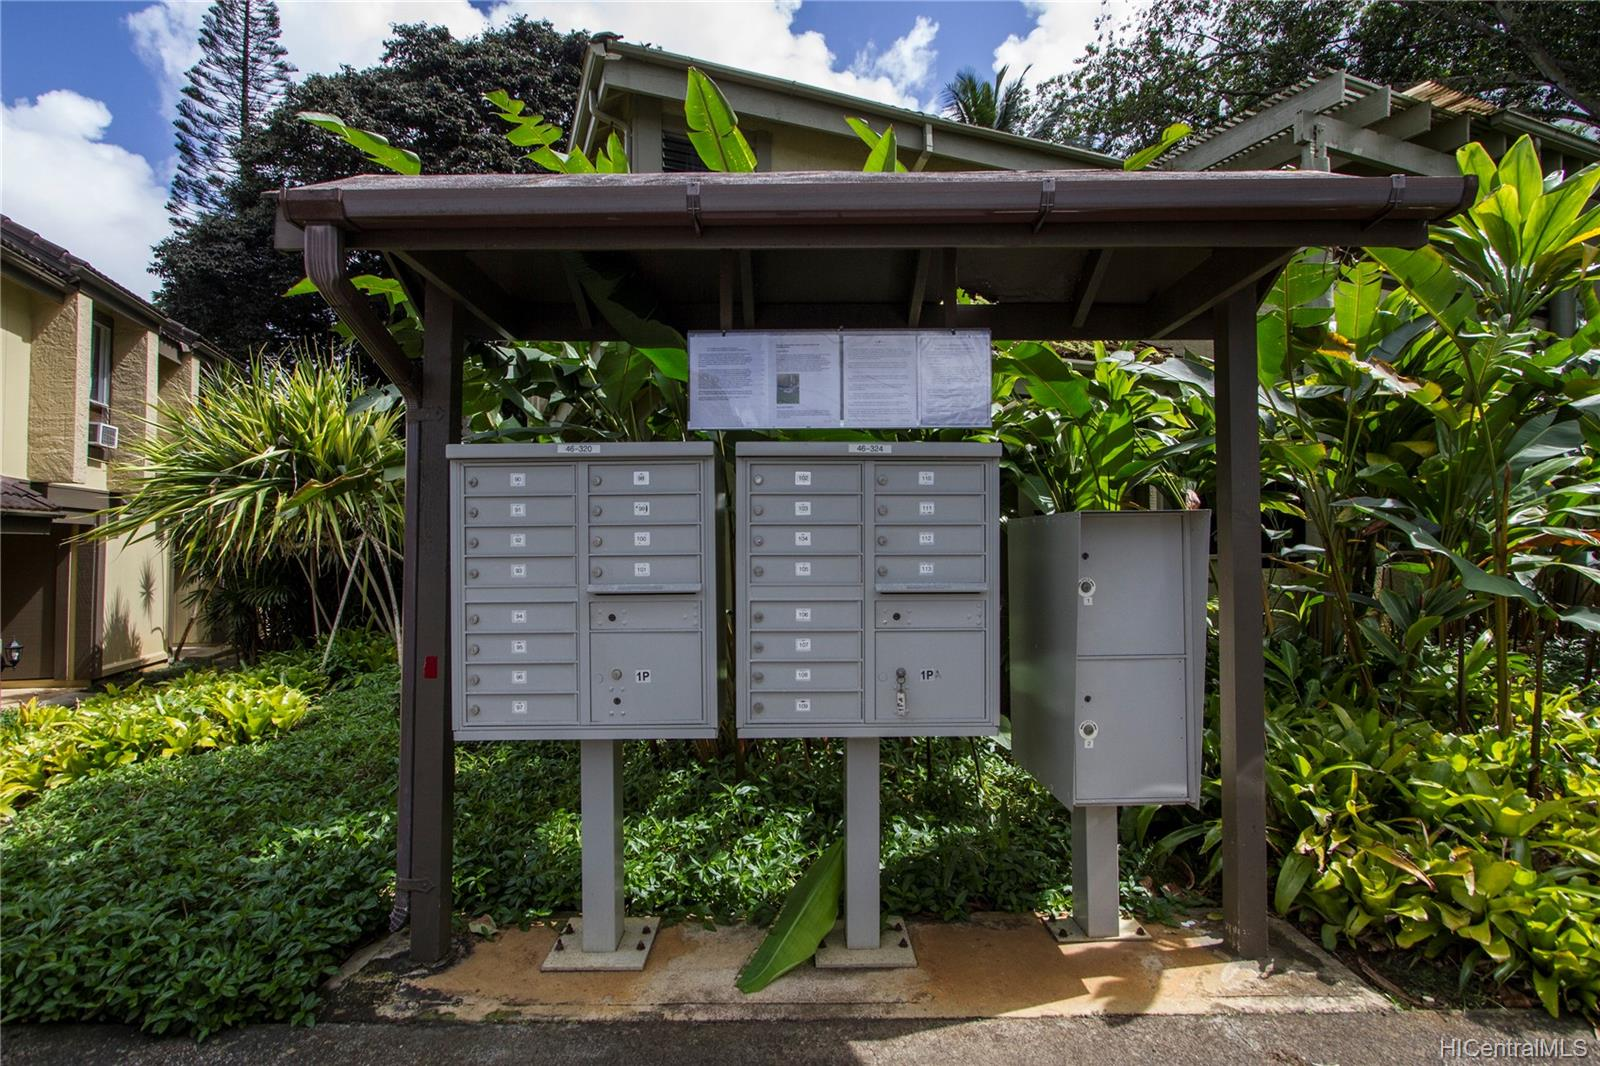 46-324 Haiku Road townhouse # 106, Kaneohe, Hawaii - photo 23 of 24